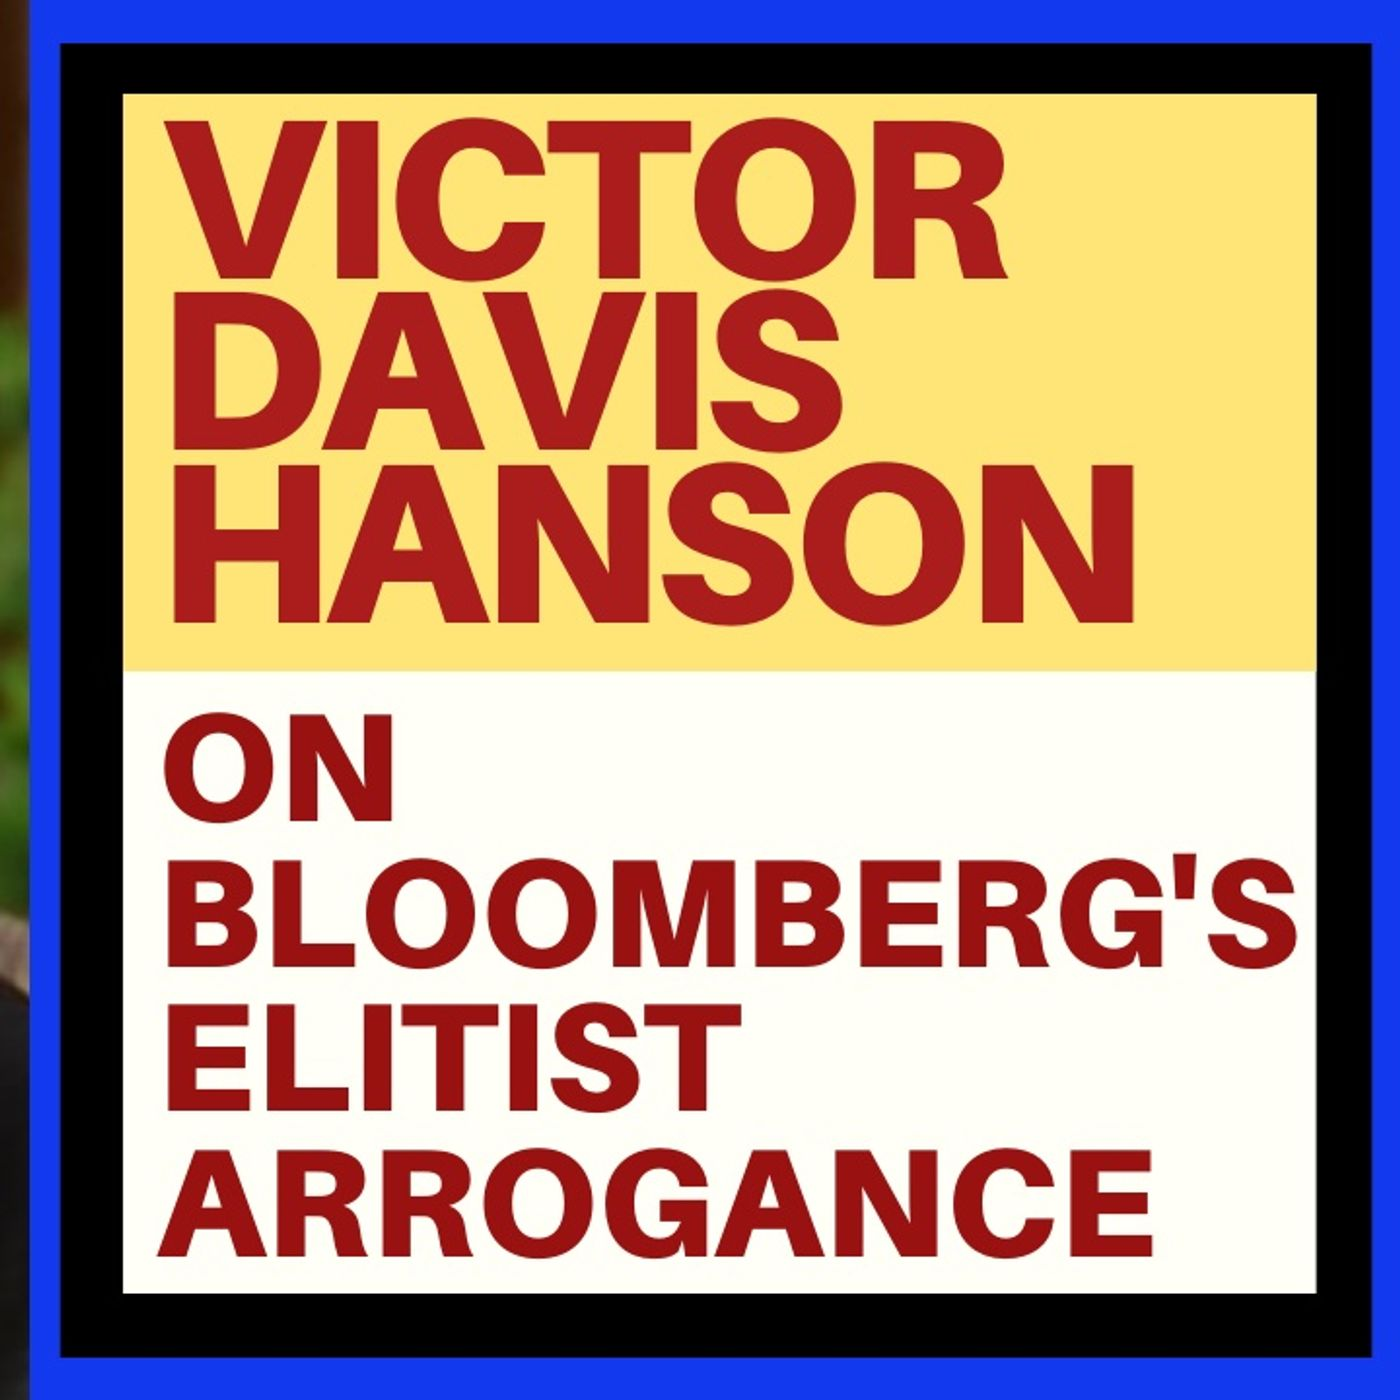 VICTOR DAVIS HANSON ON THE ELITISM OF BLOOMBERG